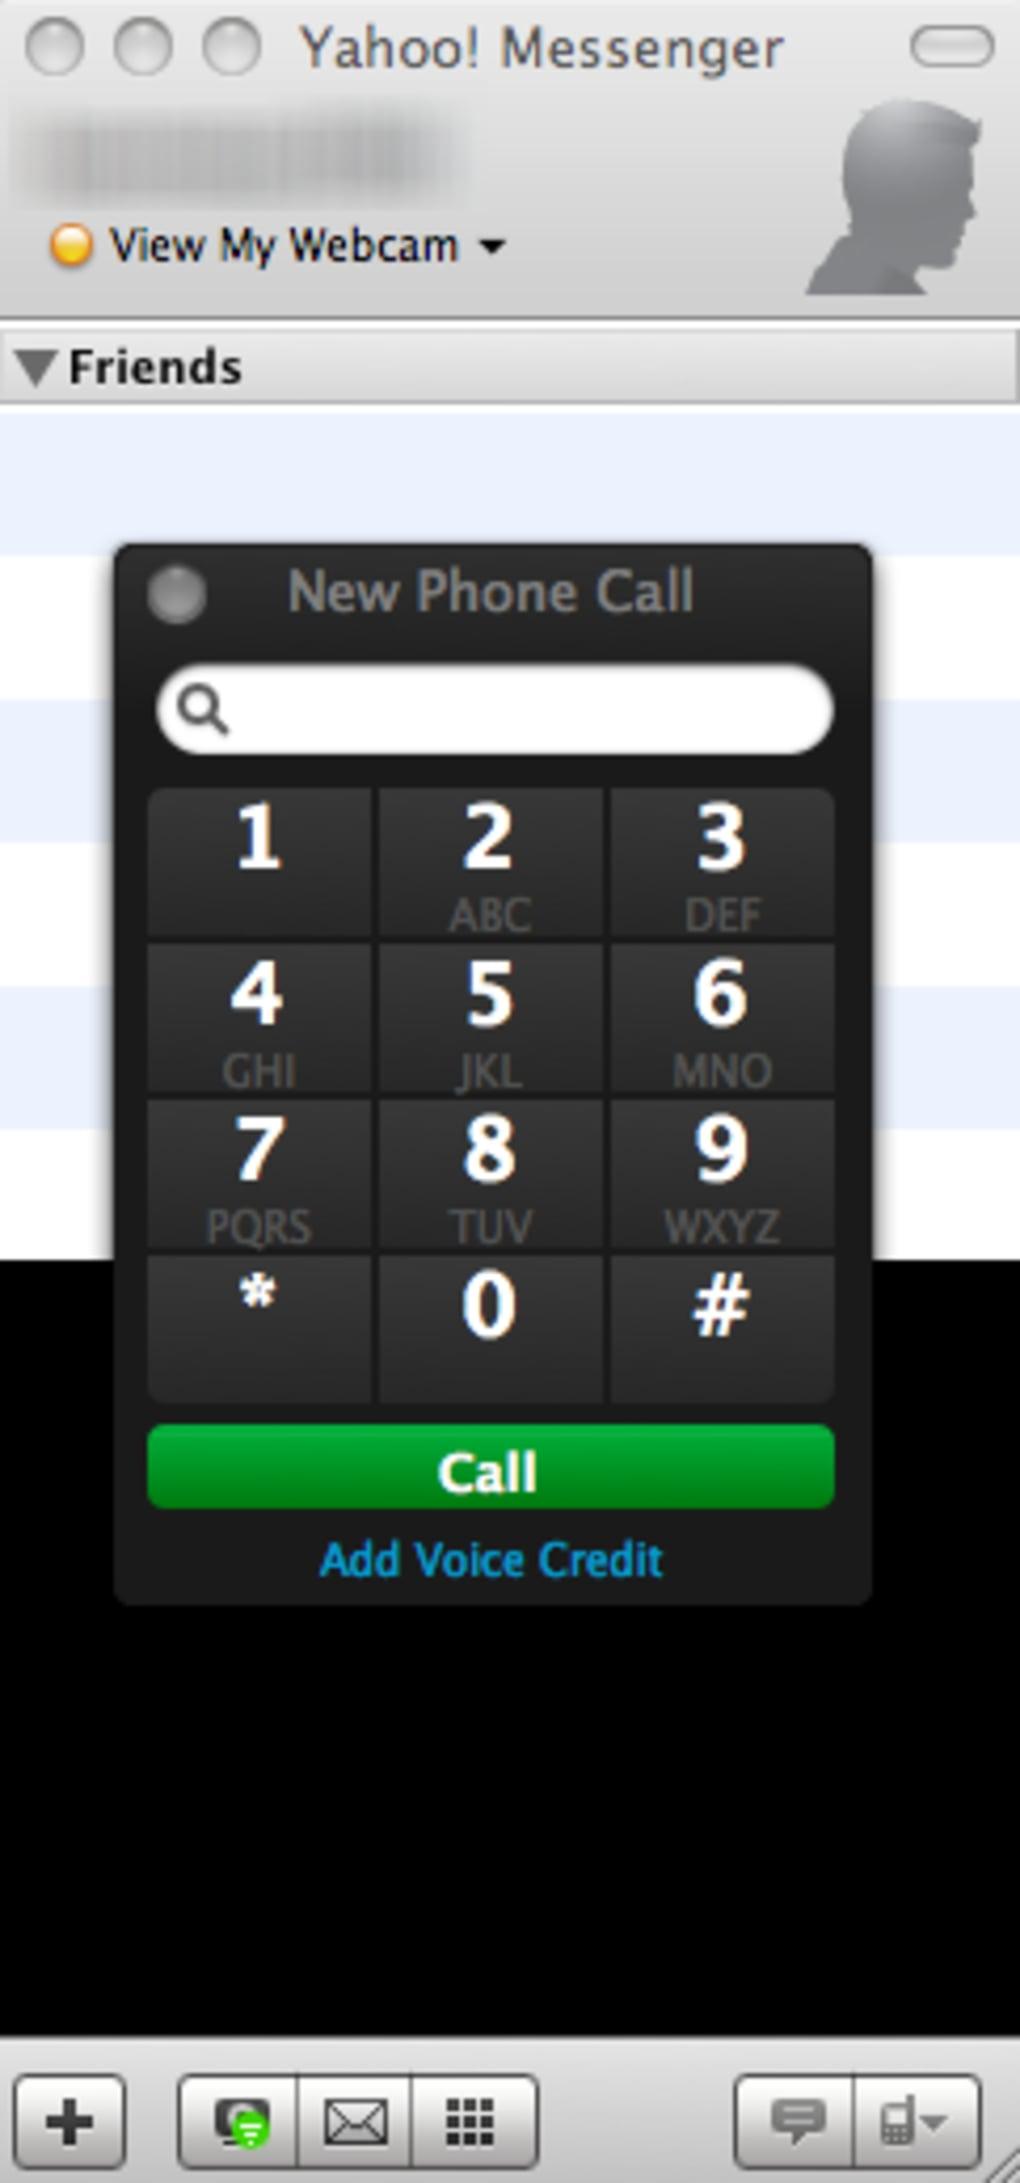 Download yahoo! Messenger windows 10 version. Free latest yahoo.